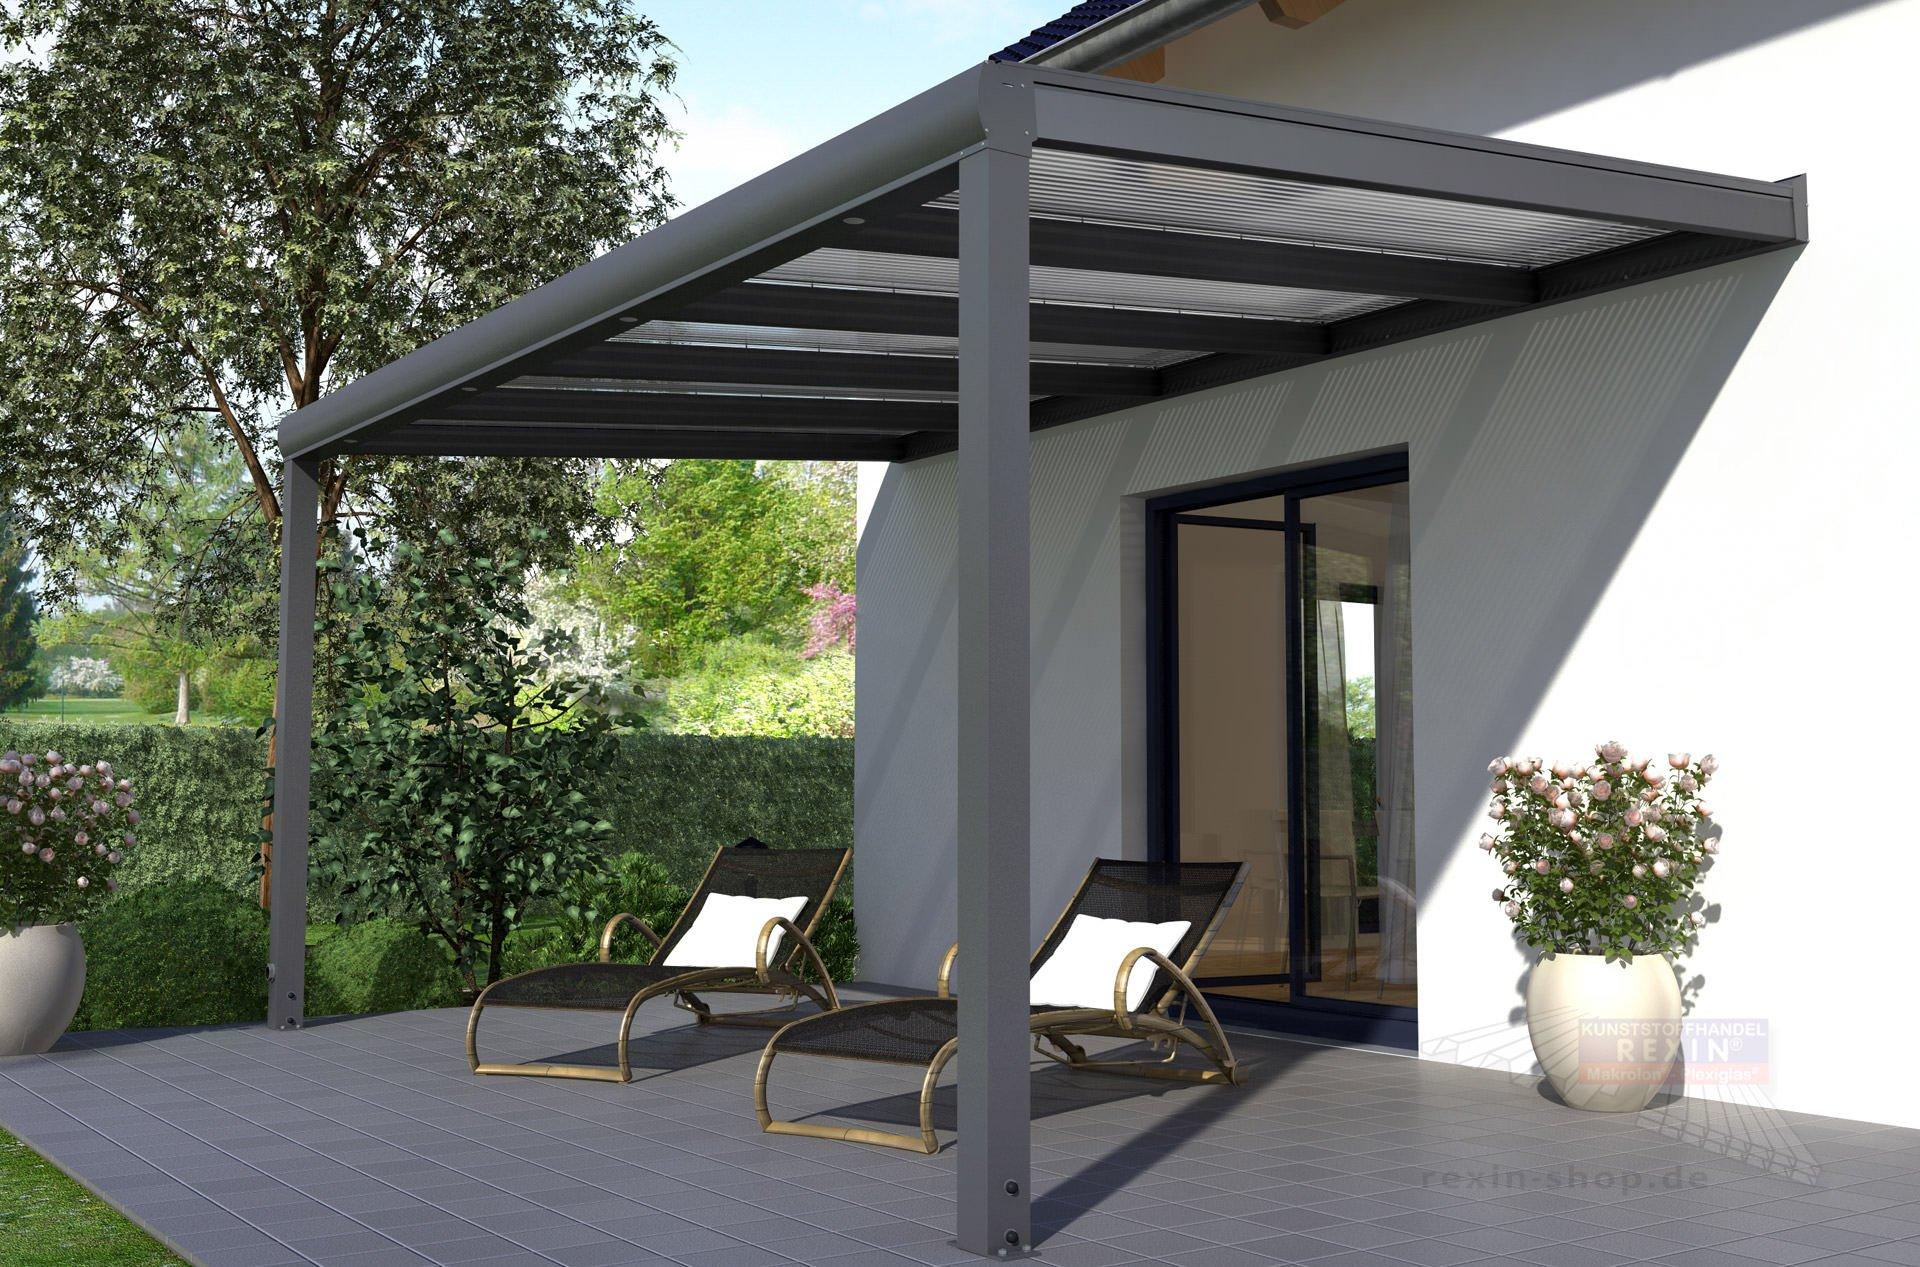 REXOpremium Alu Terrassenüberdachung 6m x 2,5m ▷ Rexin-Shop